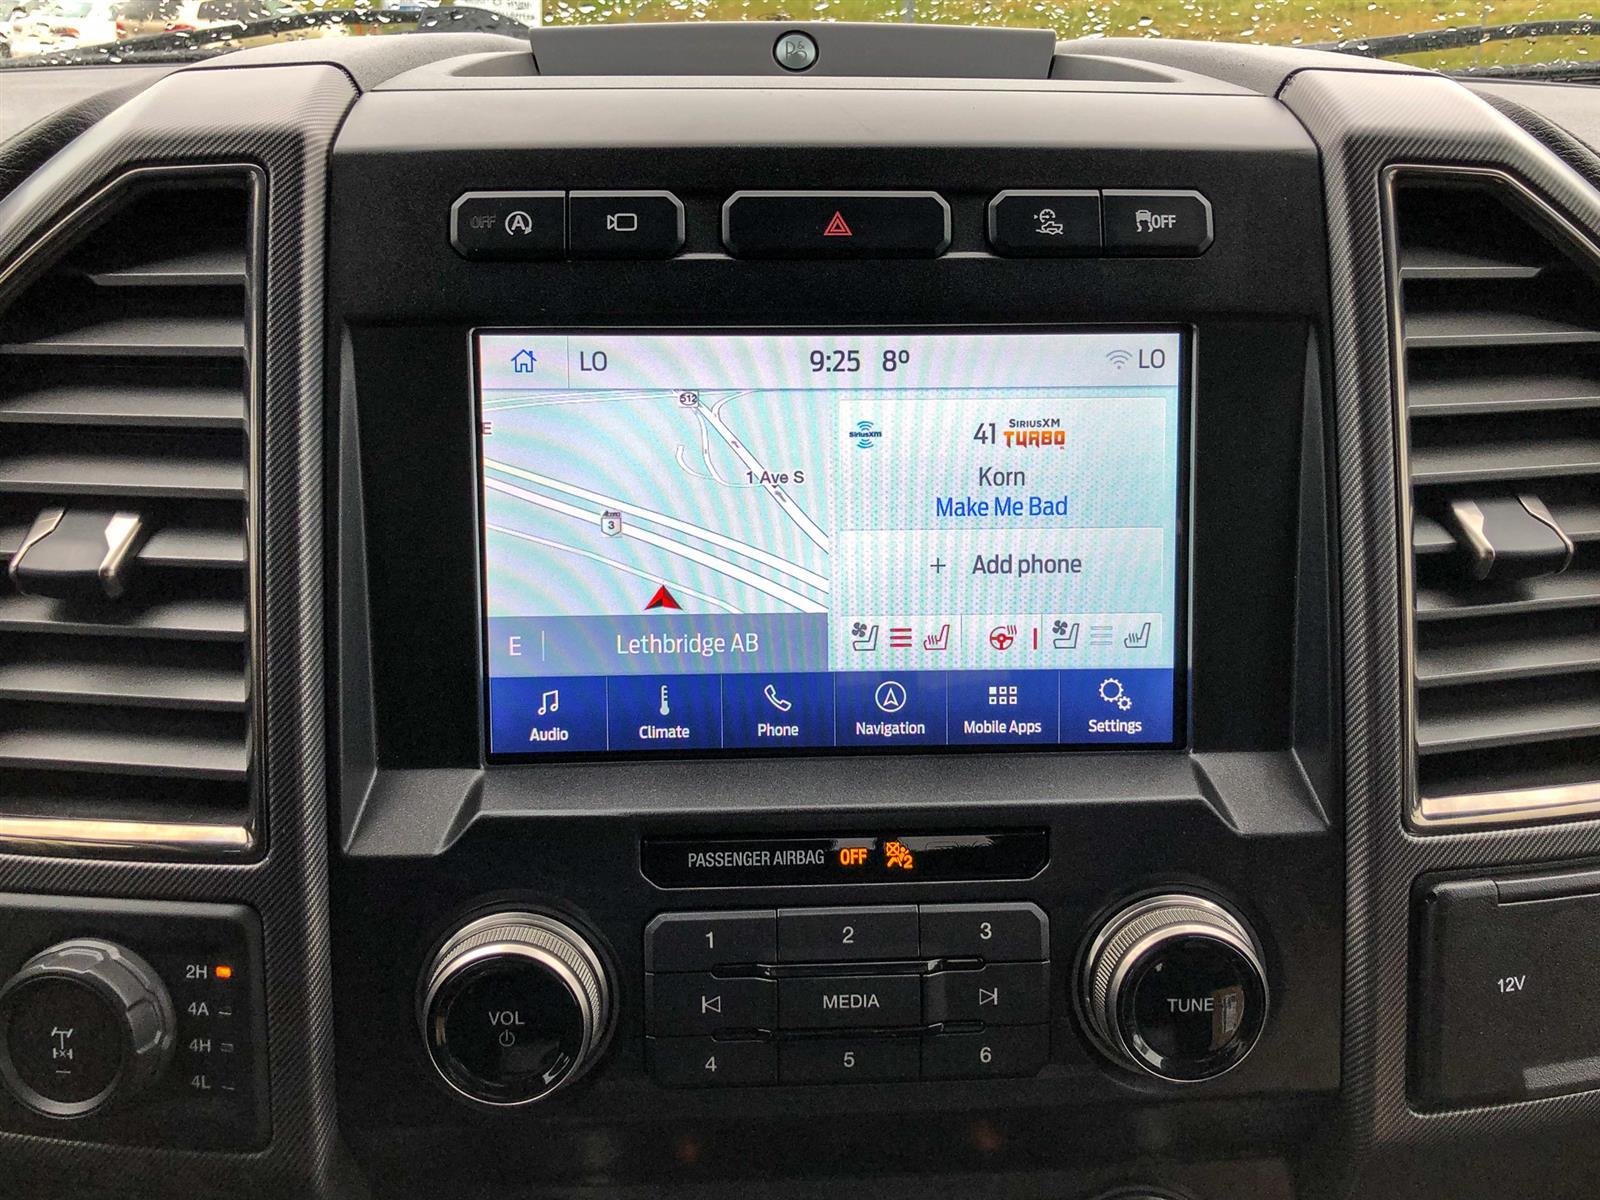 2019 Ford F-150 RAPTOR | 3.5L V6 ECOBOOST HIGH OUTPUT | 4X4 | MOONROOF | FULLY-L